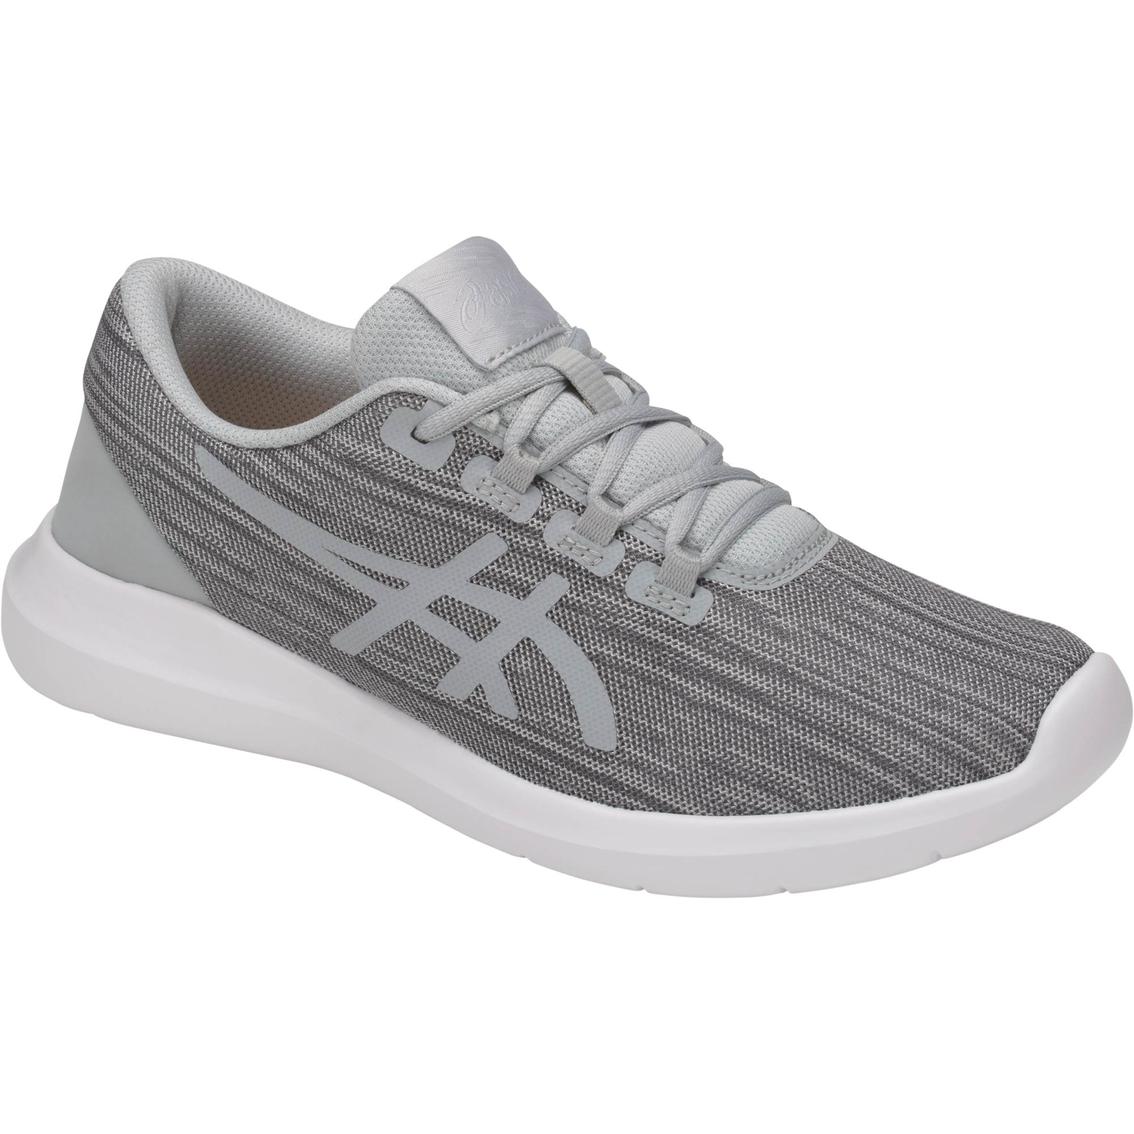 ccc86f919223bb Asics Women s Metrolyte Ii Slip On Walking Shoes